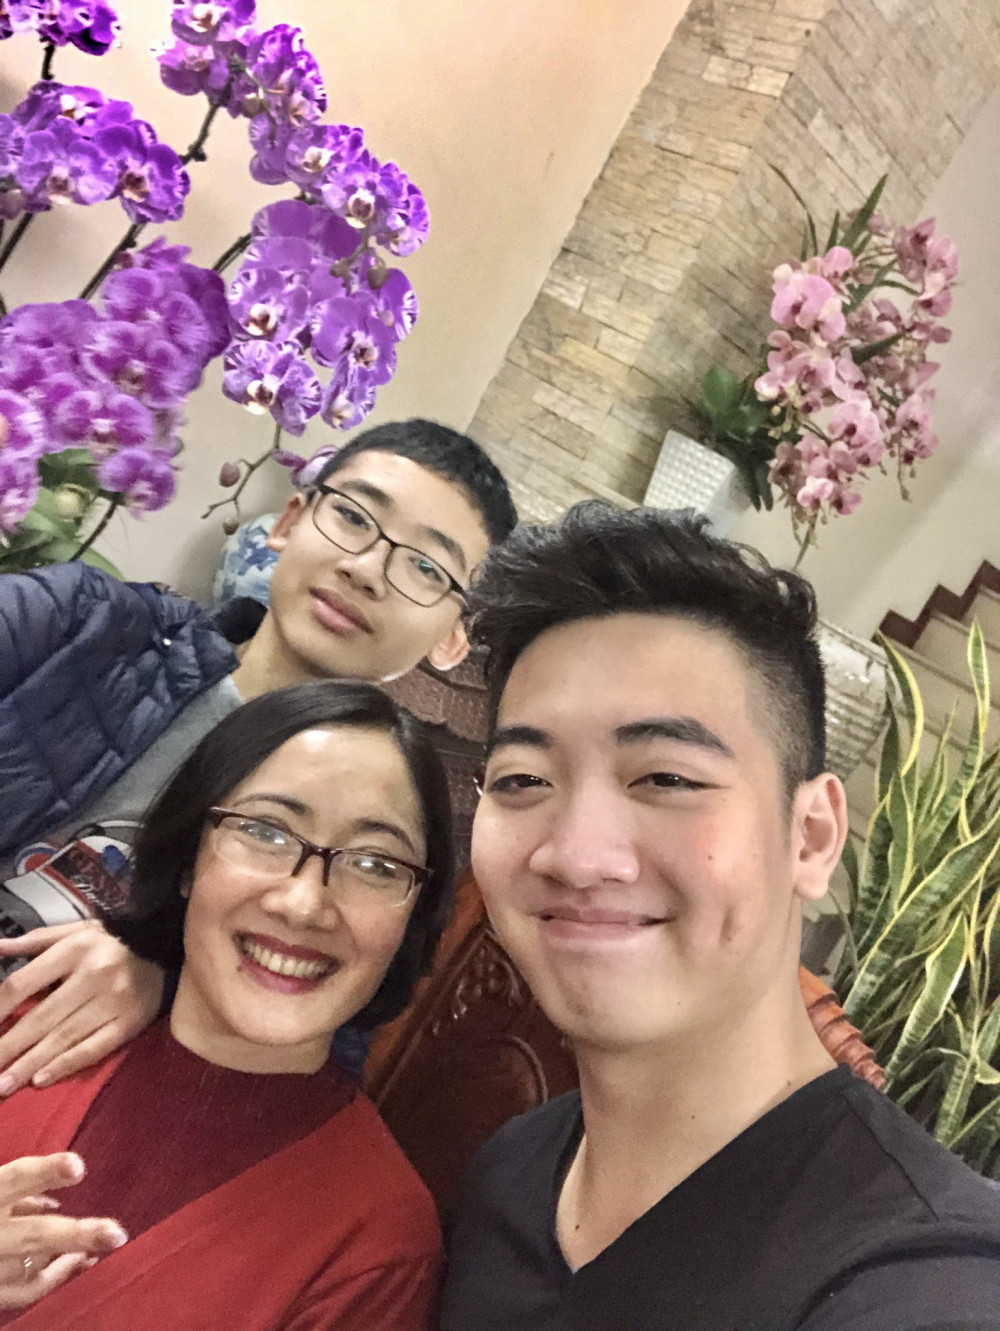 Nhà thơ Đỗ Mai Hòa và 2 con trai